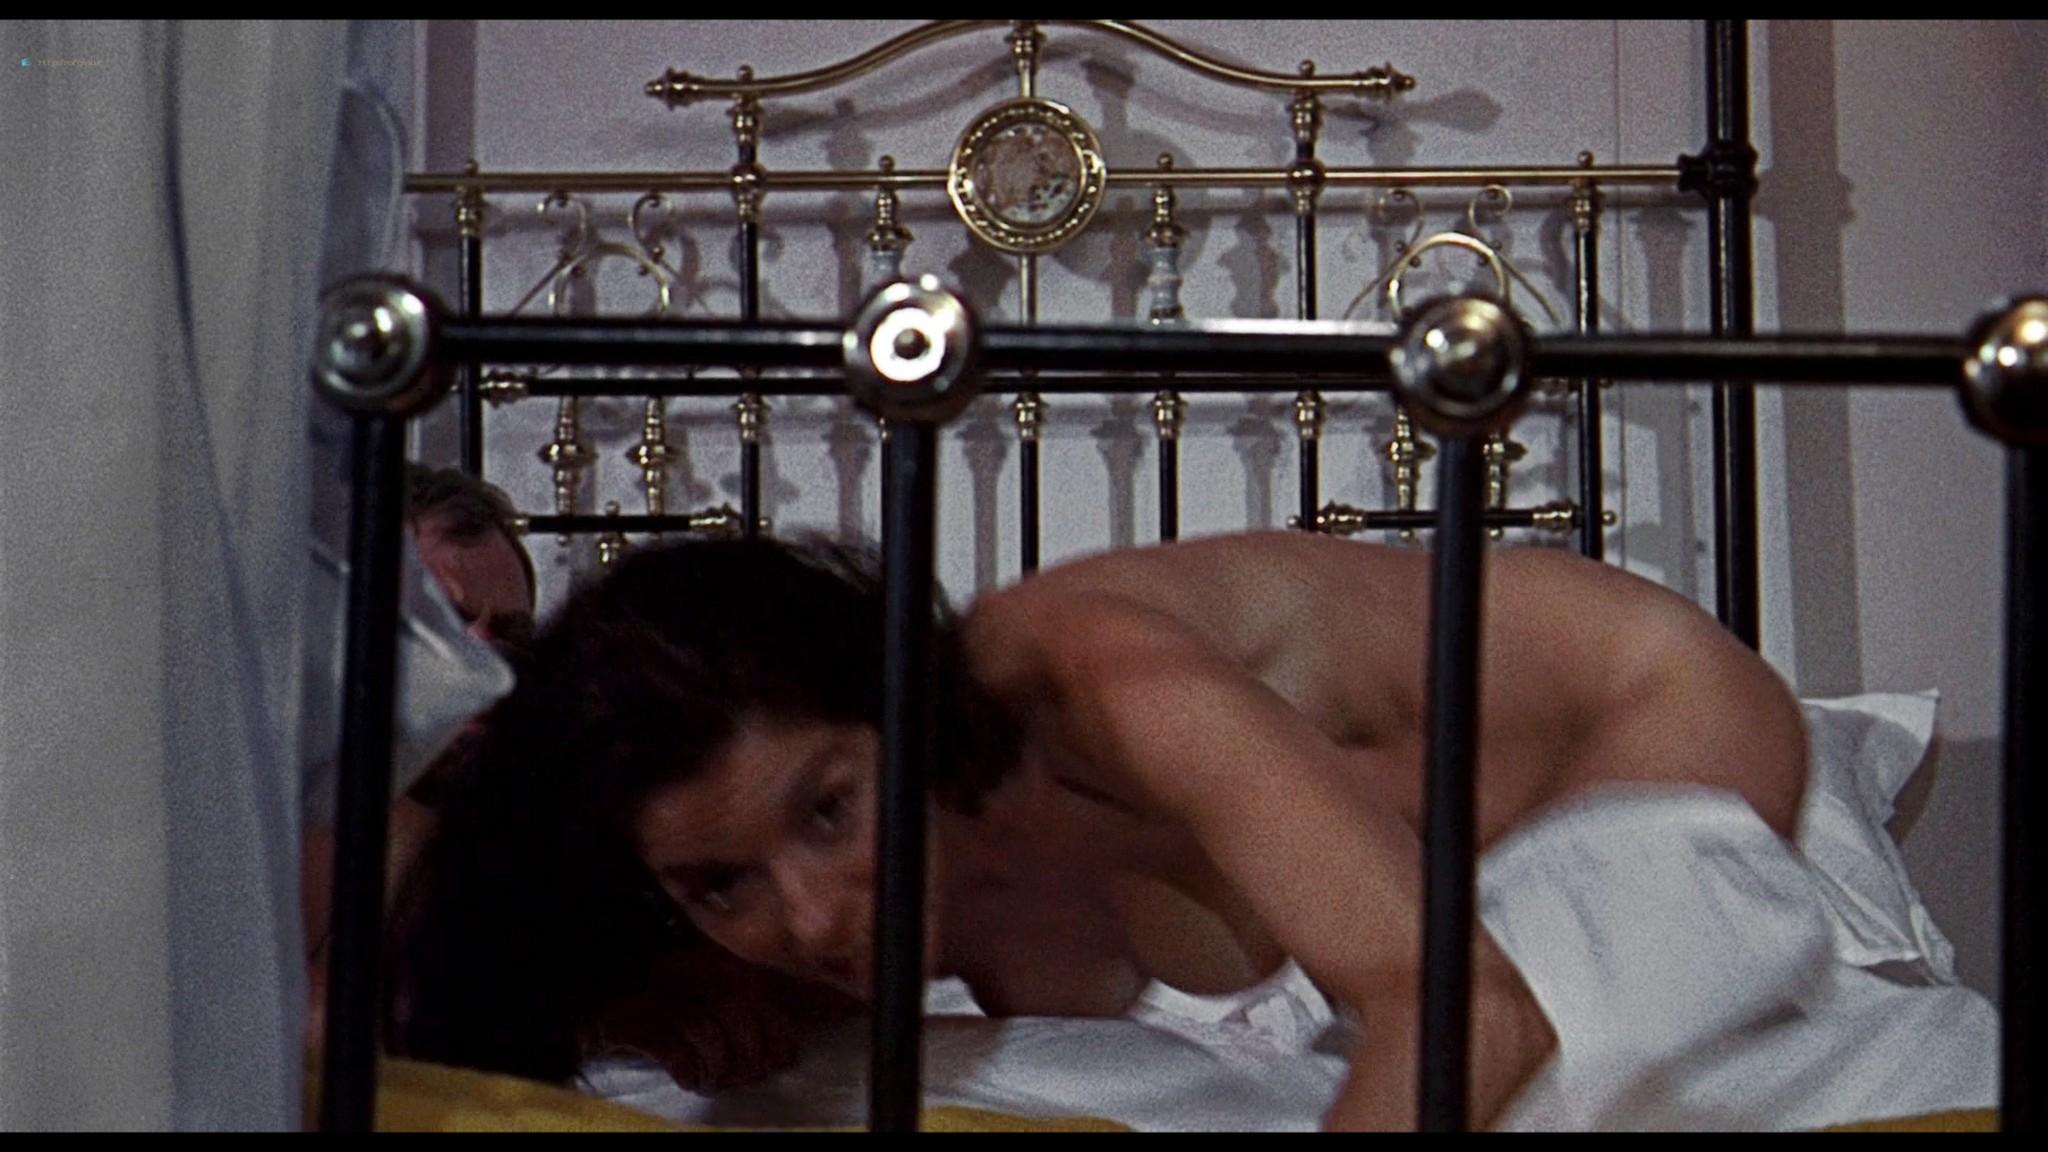 Helen Mirren nude skinny dipping Clarissa Kaye-Mason nude sex - Age of Consent (1969) HD 1080p BluRay Remux (19)